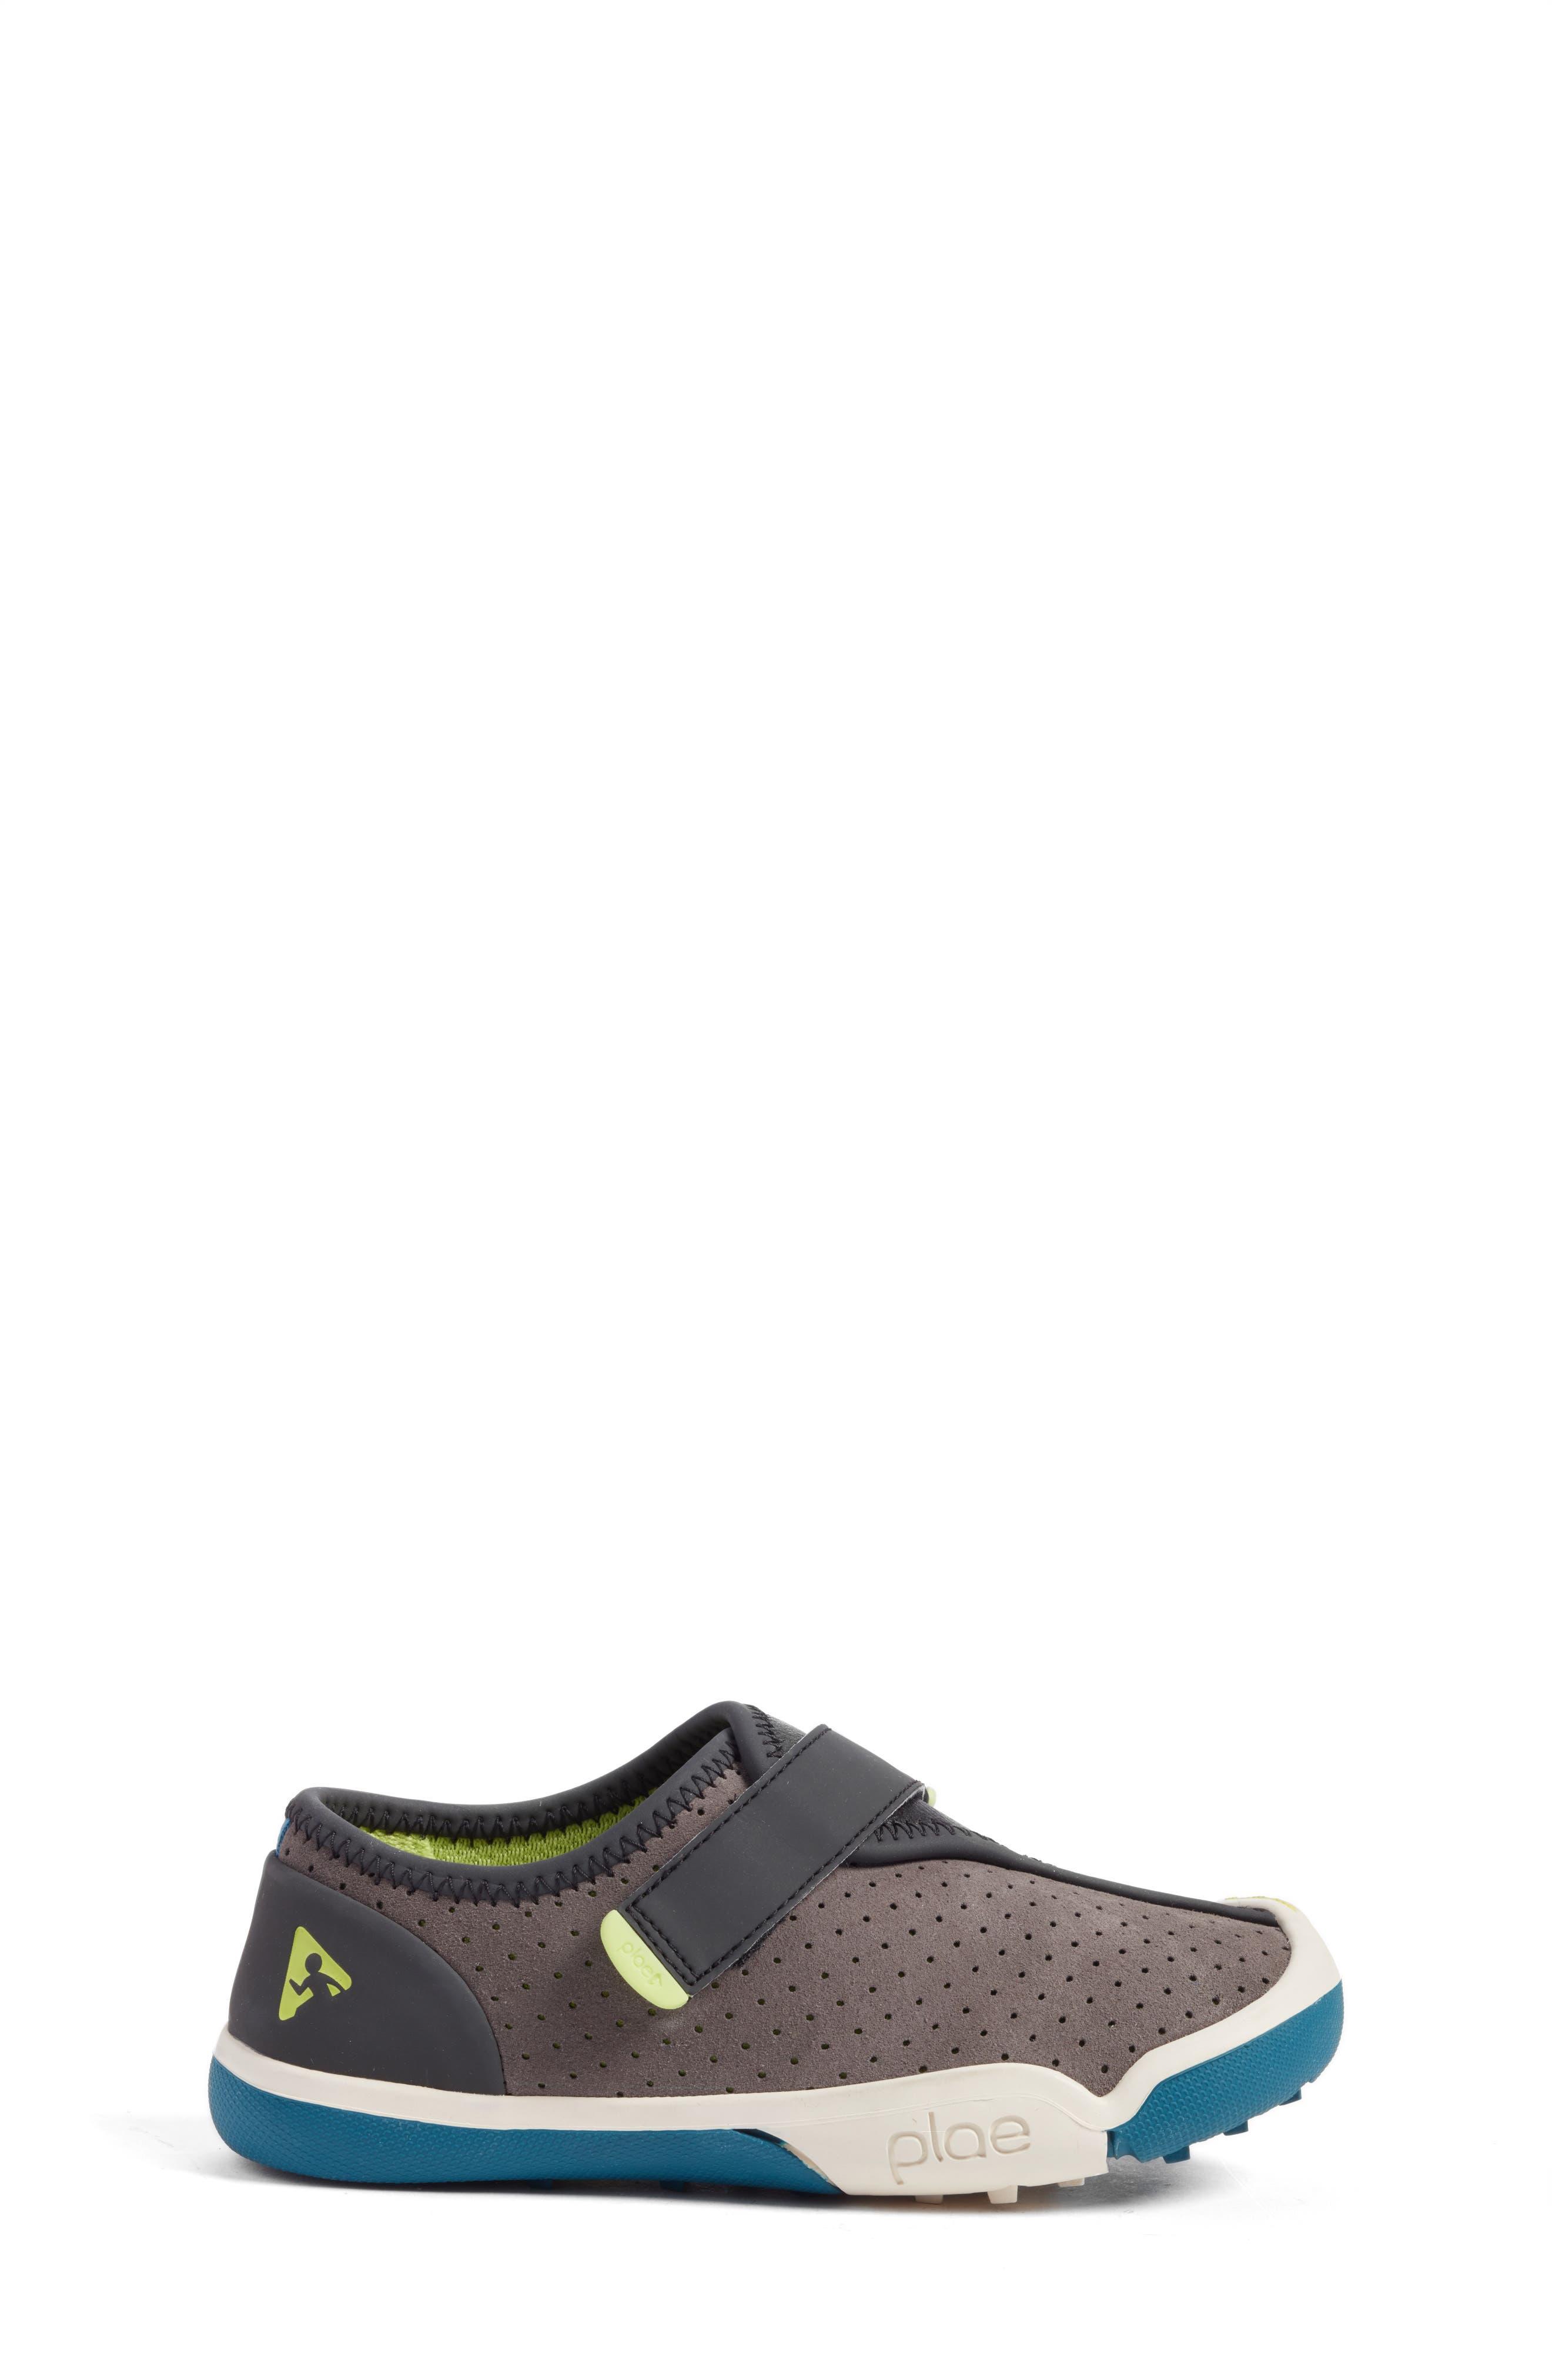 Cam Perforated Sneaker,                             Alternate thumbnail 3, color,                             025